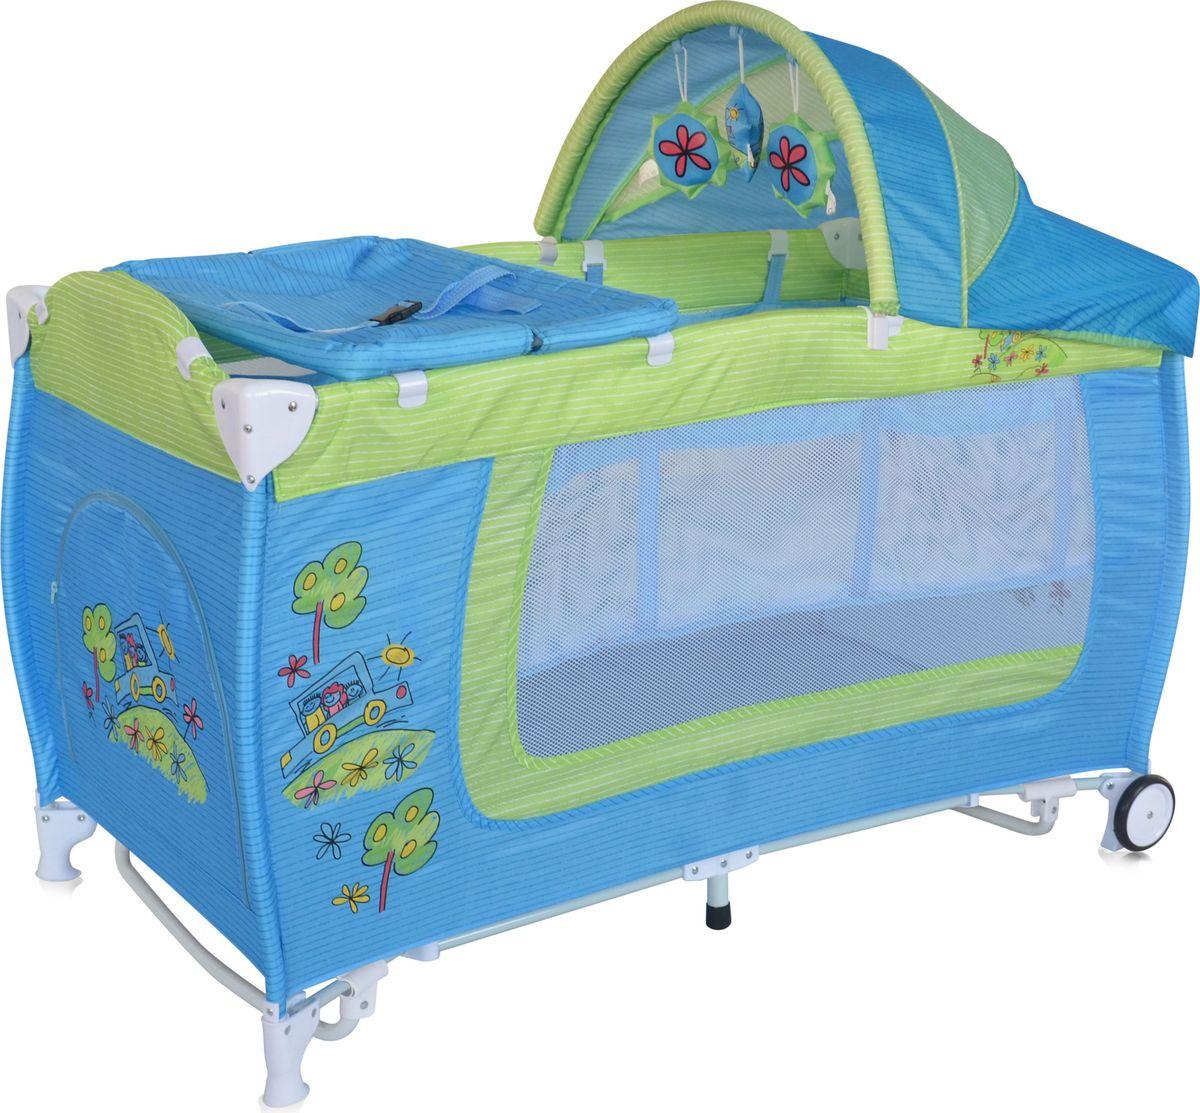 Lorelli Манеж Danny 2 Rocker цвет синий зеленый - Детская комната